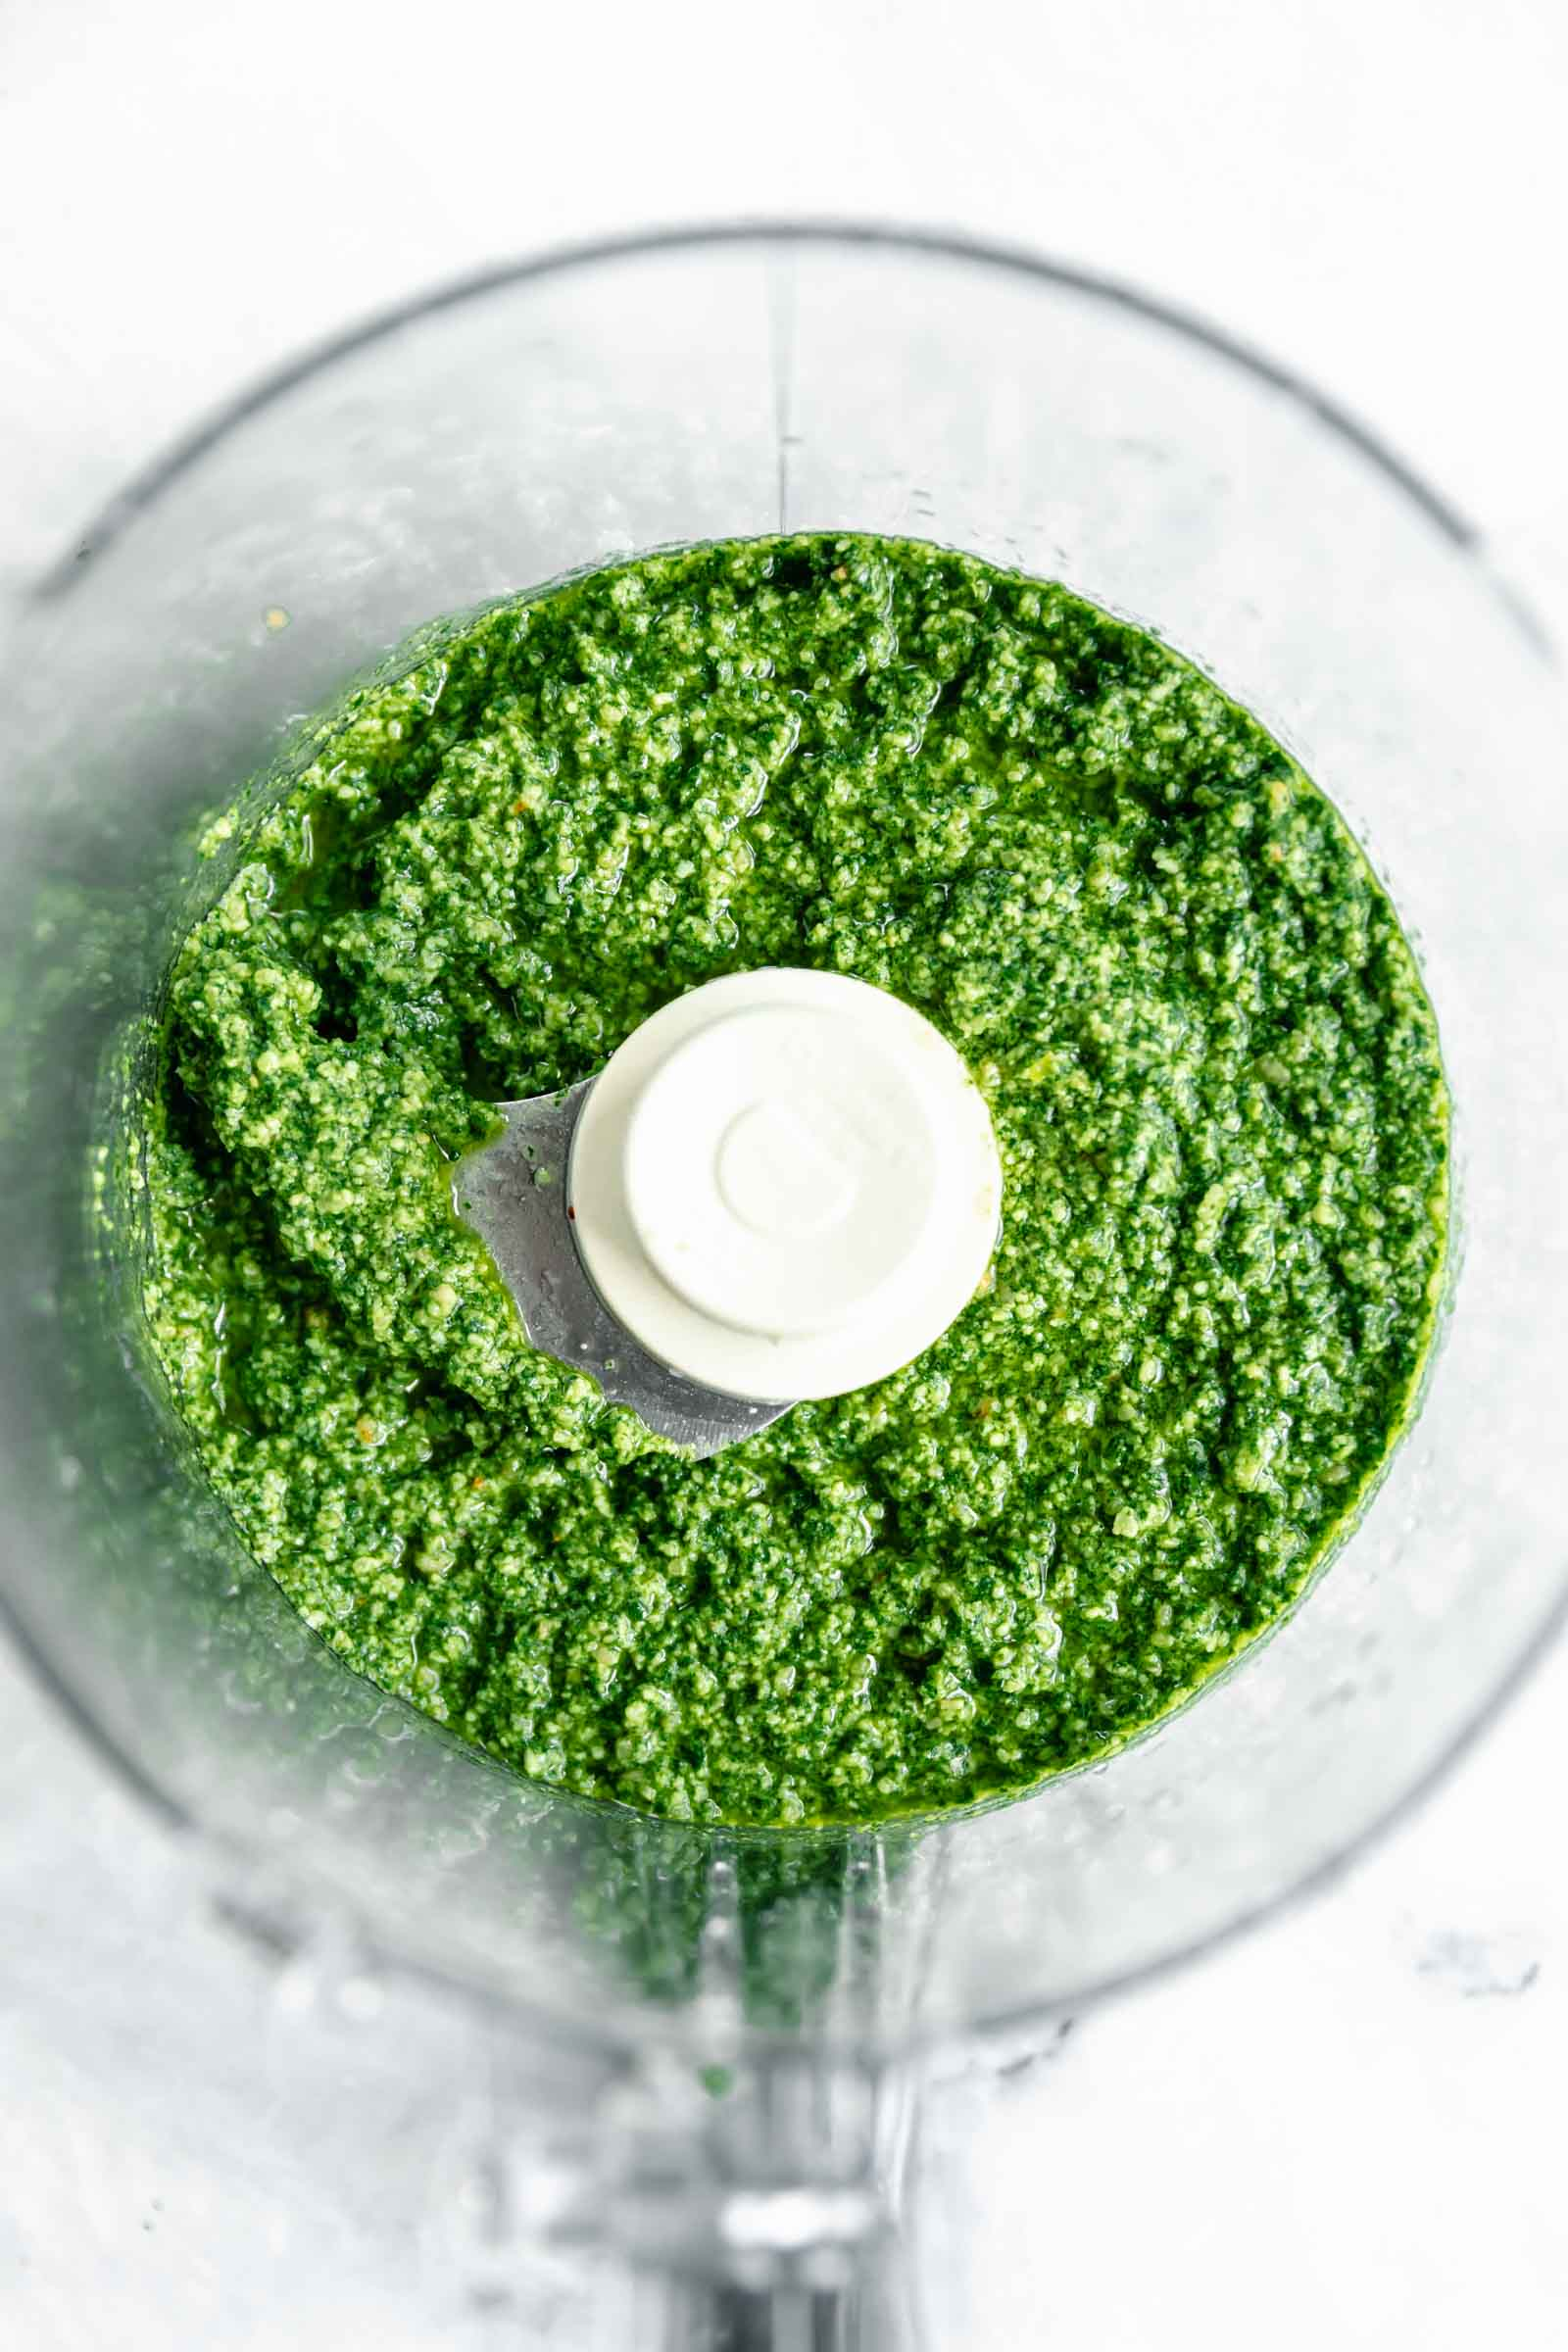 easy homemade pesto in a food processor